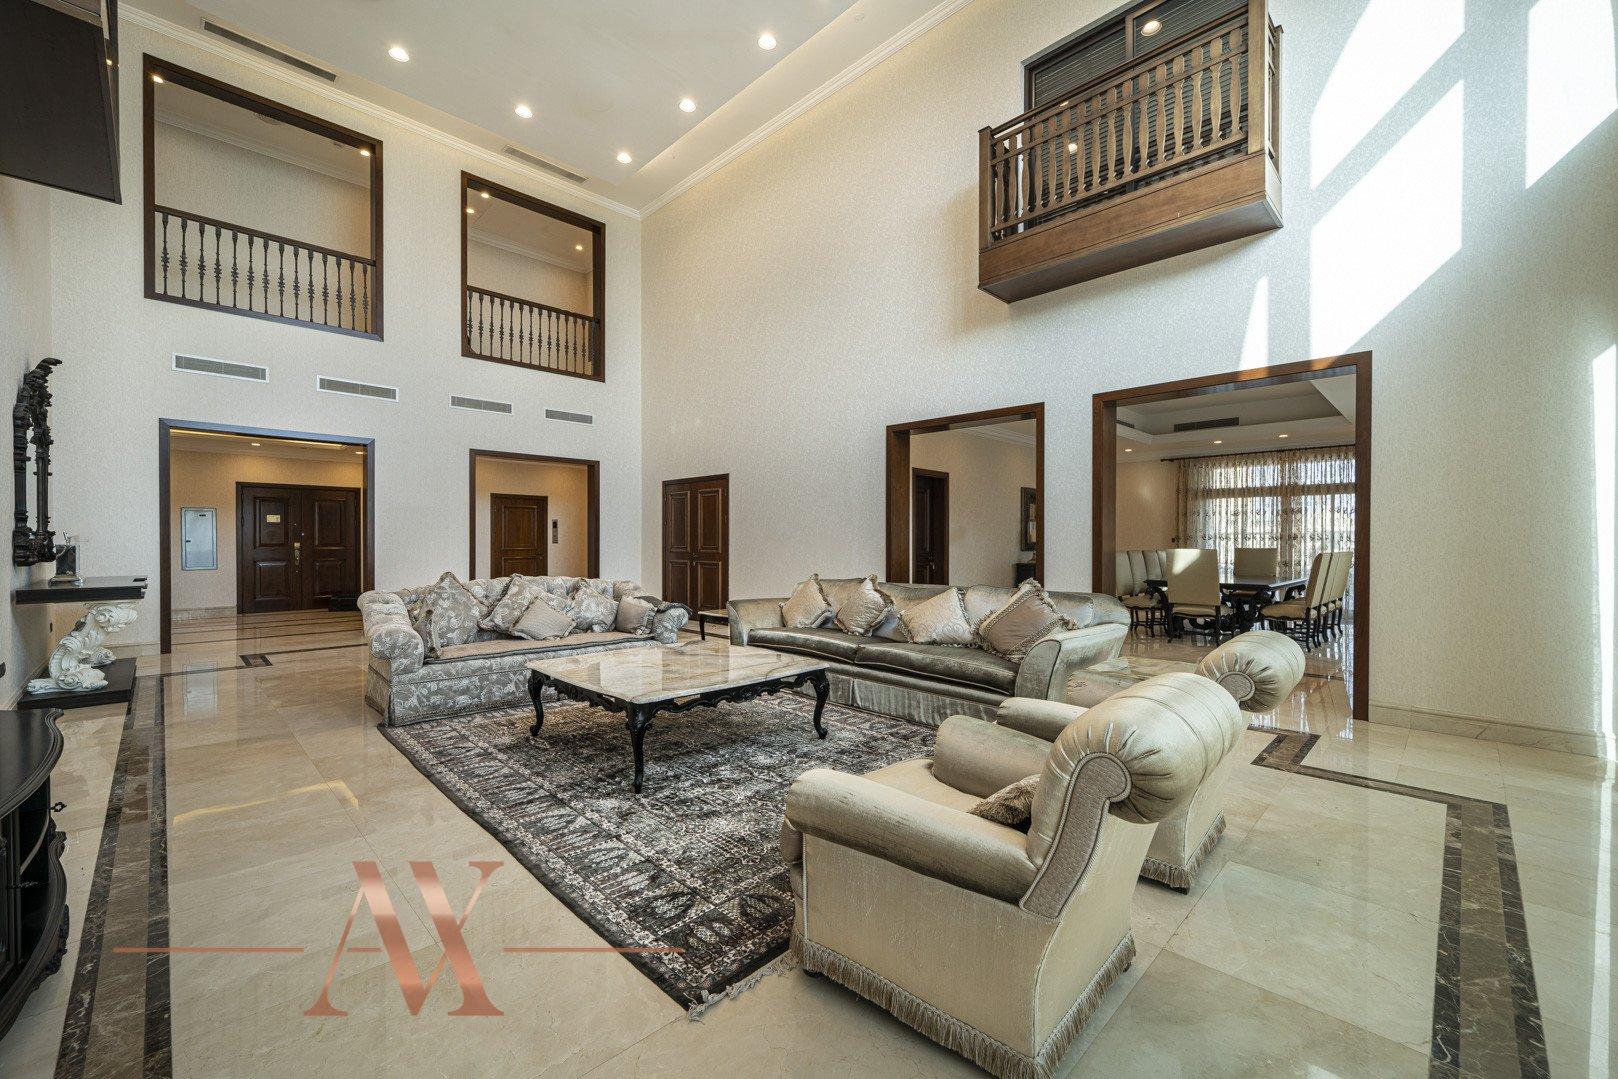 Penthouse for sale in Dubai, UAE, 5 bedrooms, 1057 m2, No. 23747 – photo 1